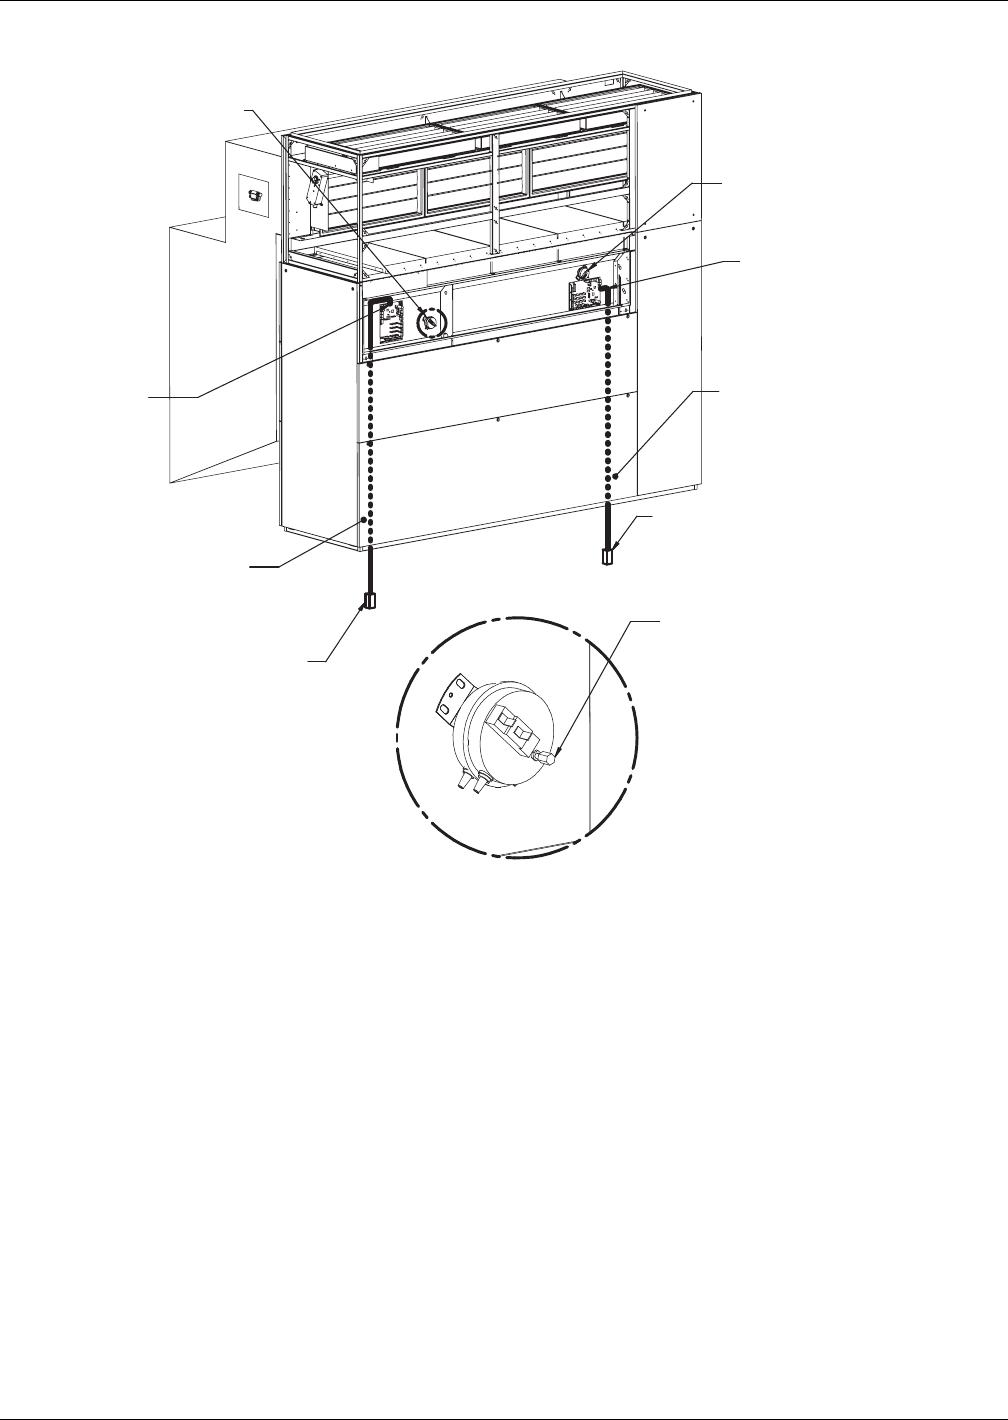 Lead Lag Pump Control Wiring Diagram